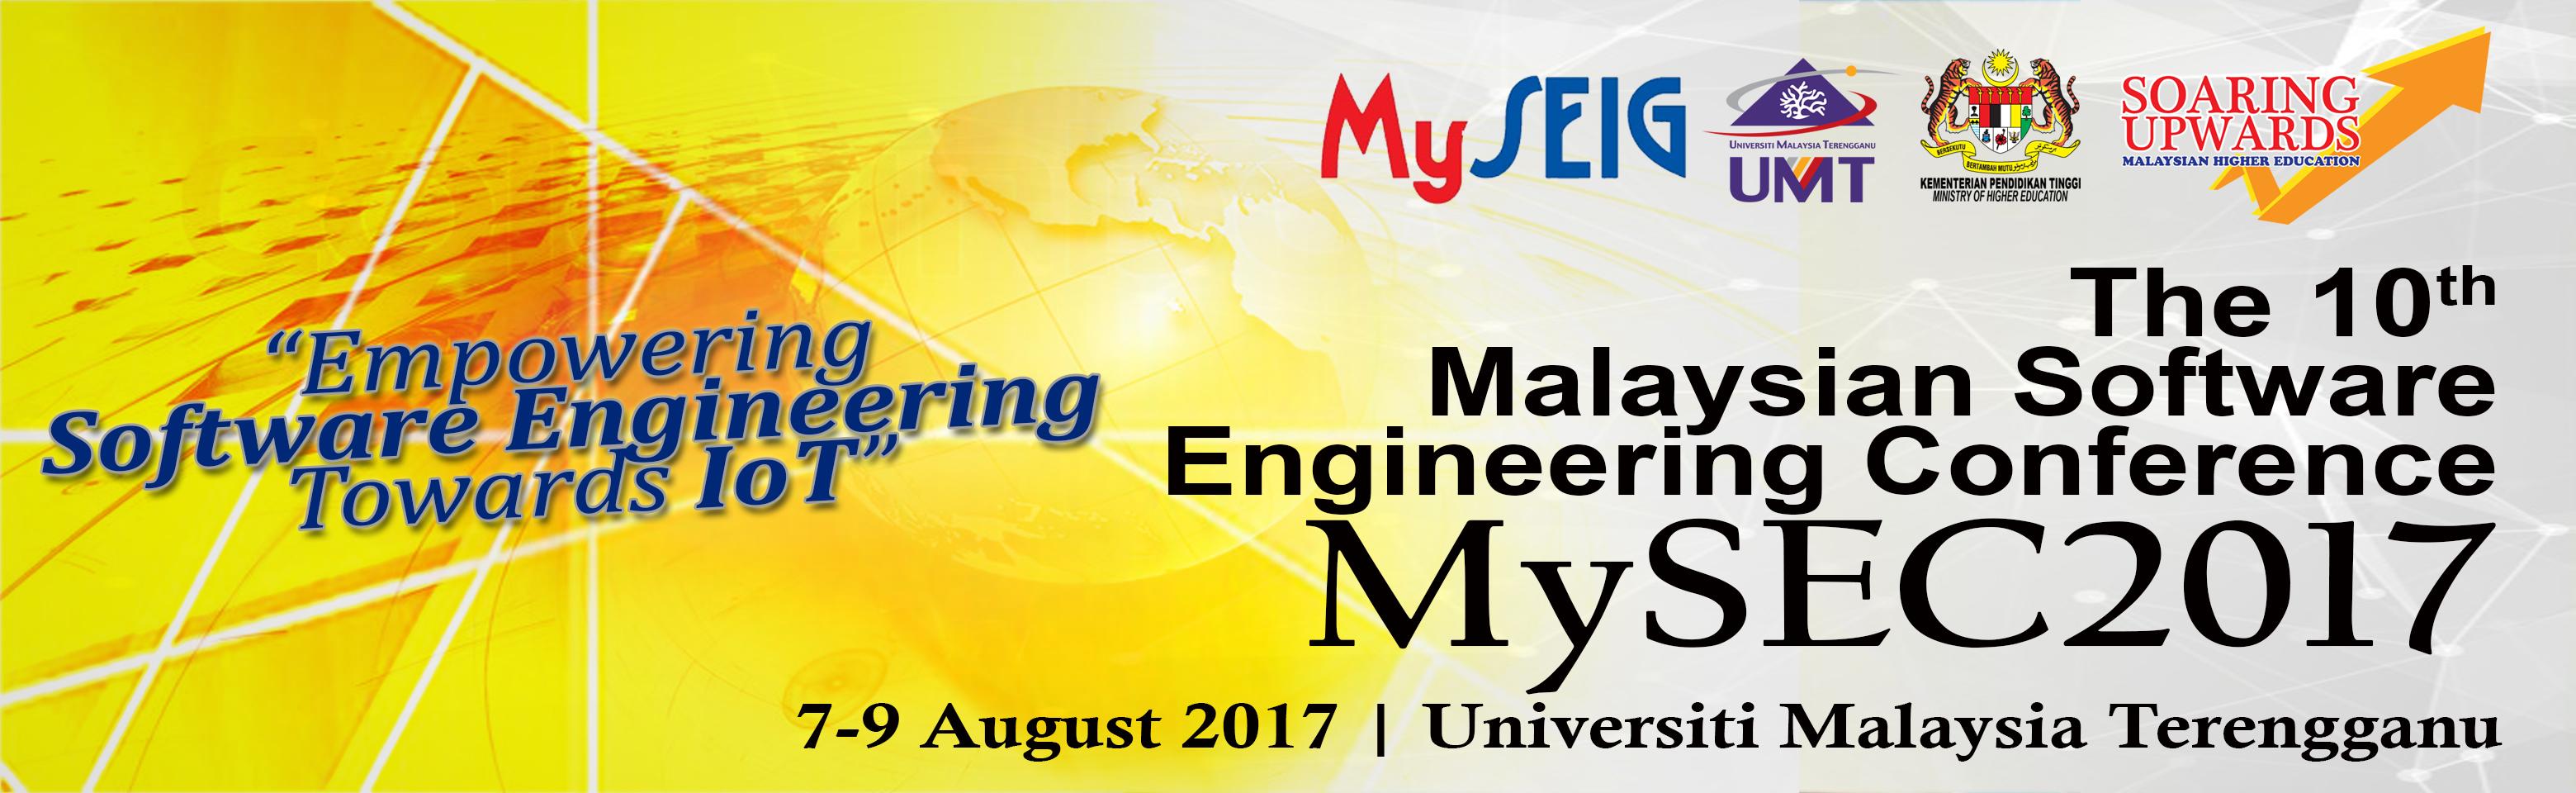 MySEC2017